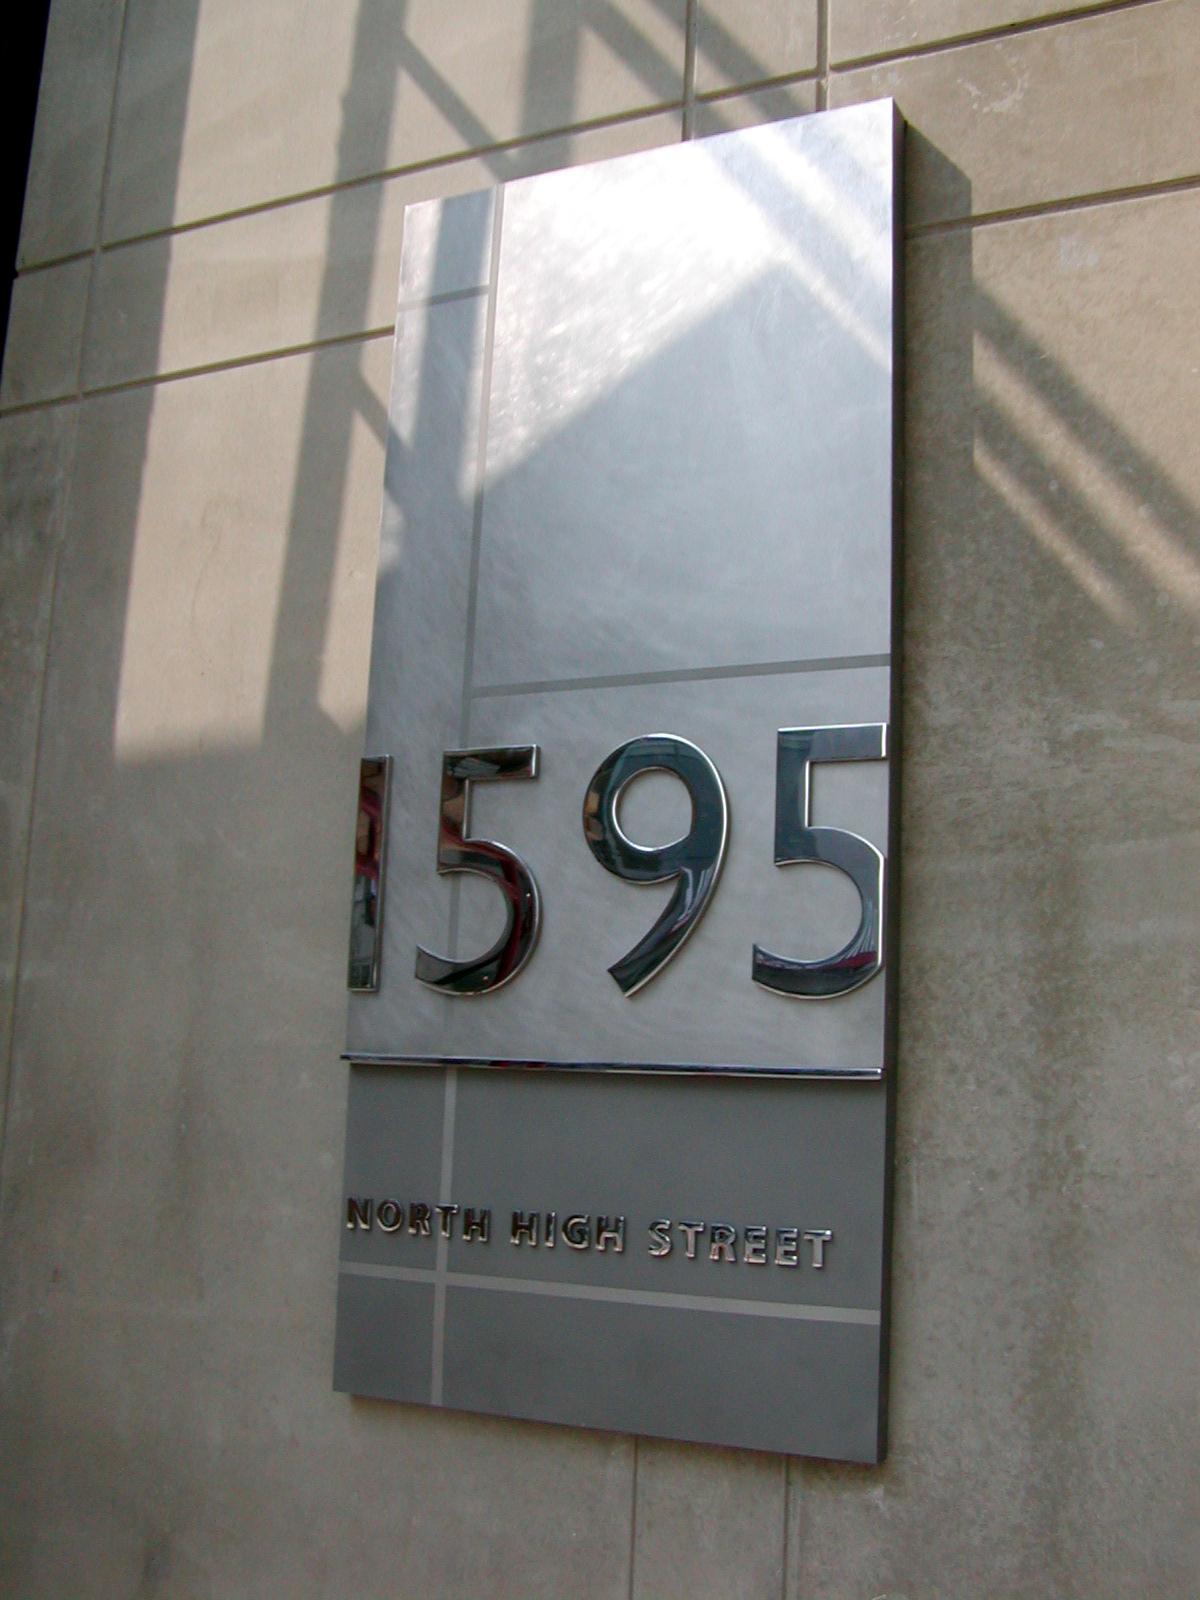 1595-sign.jpg